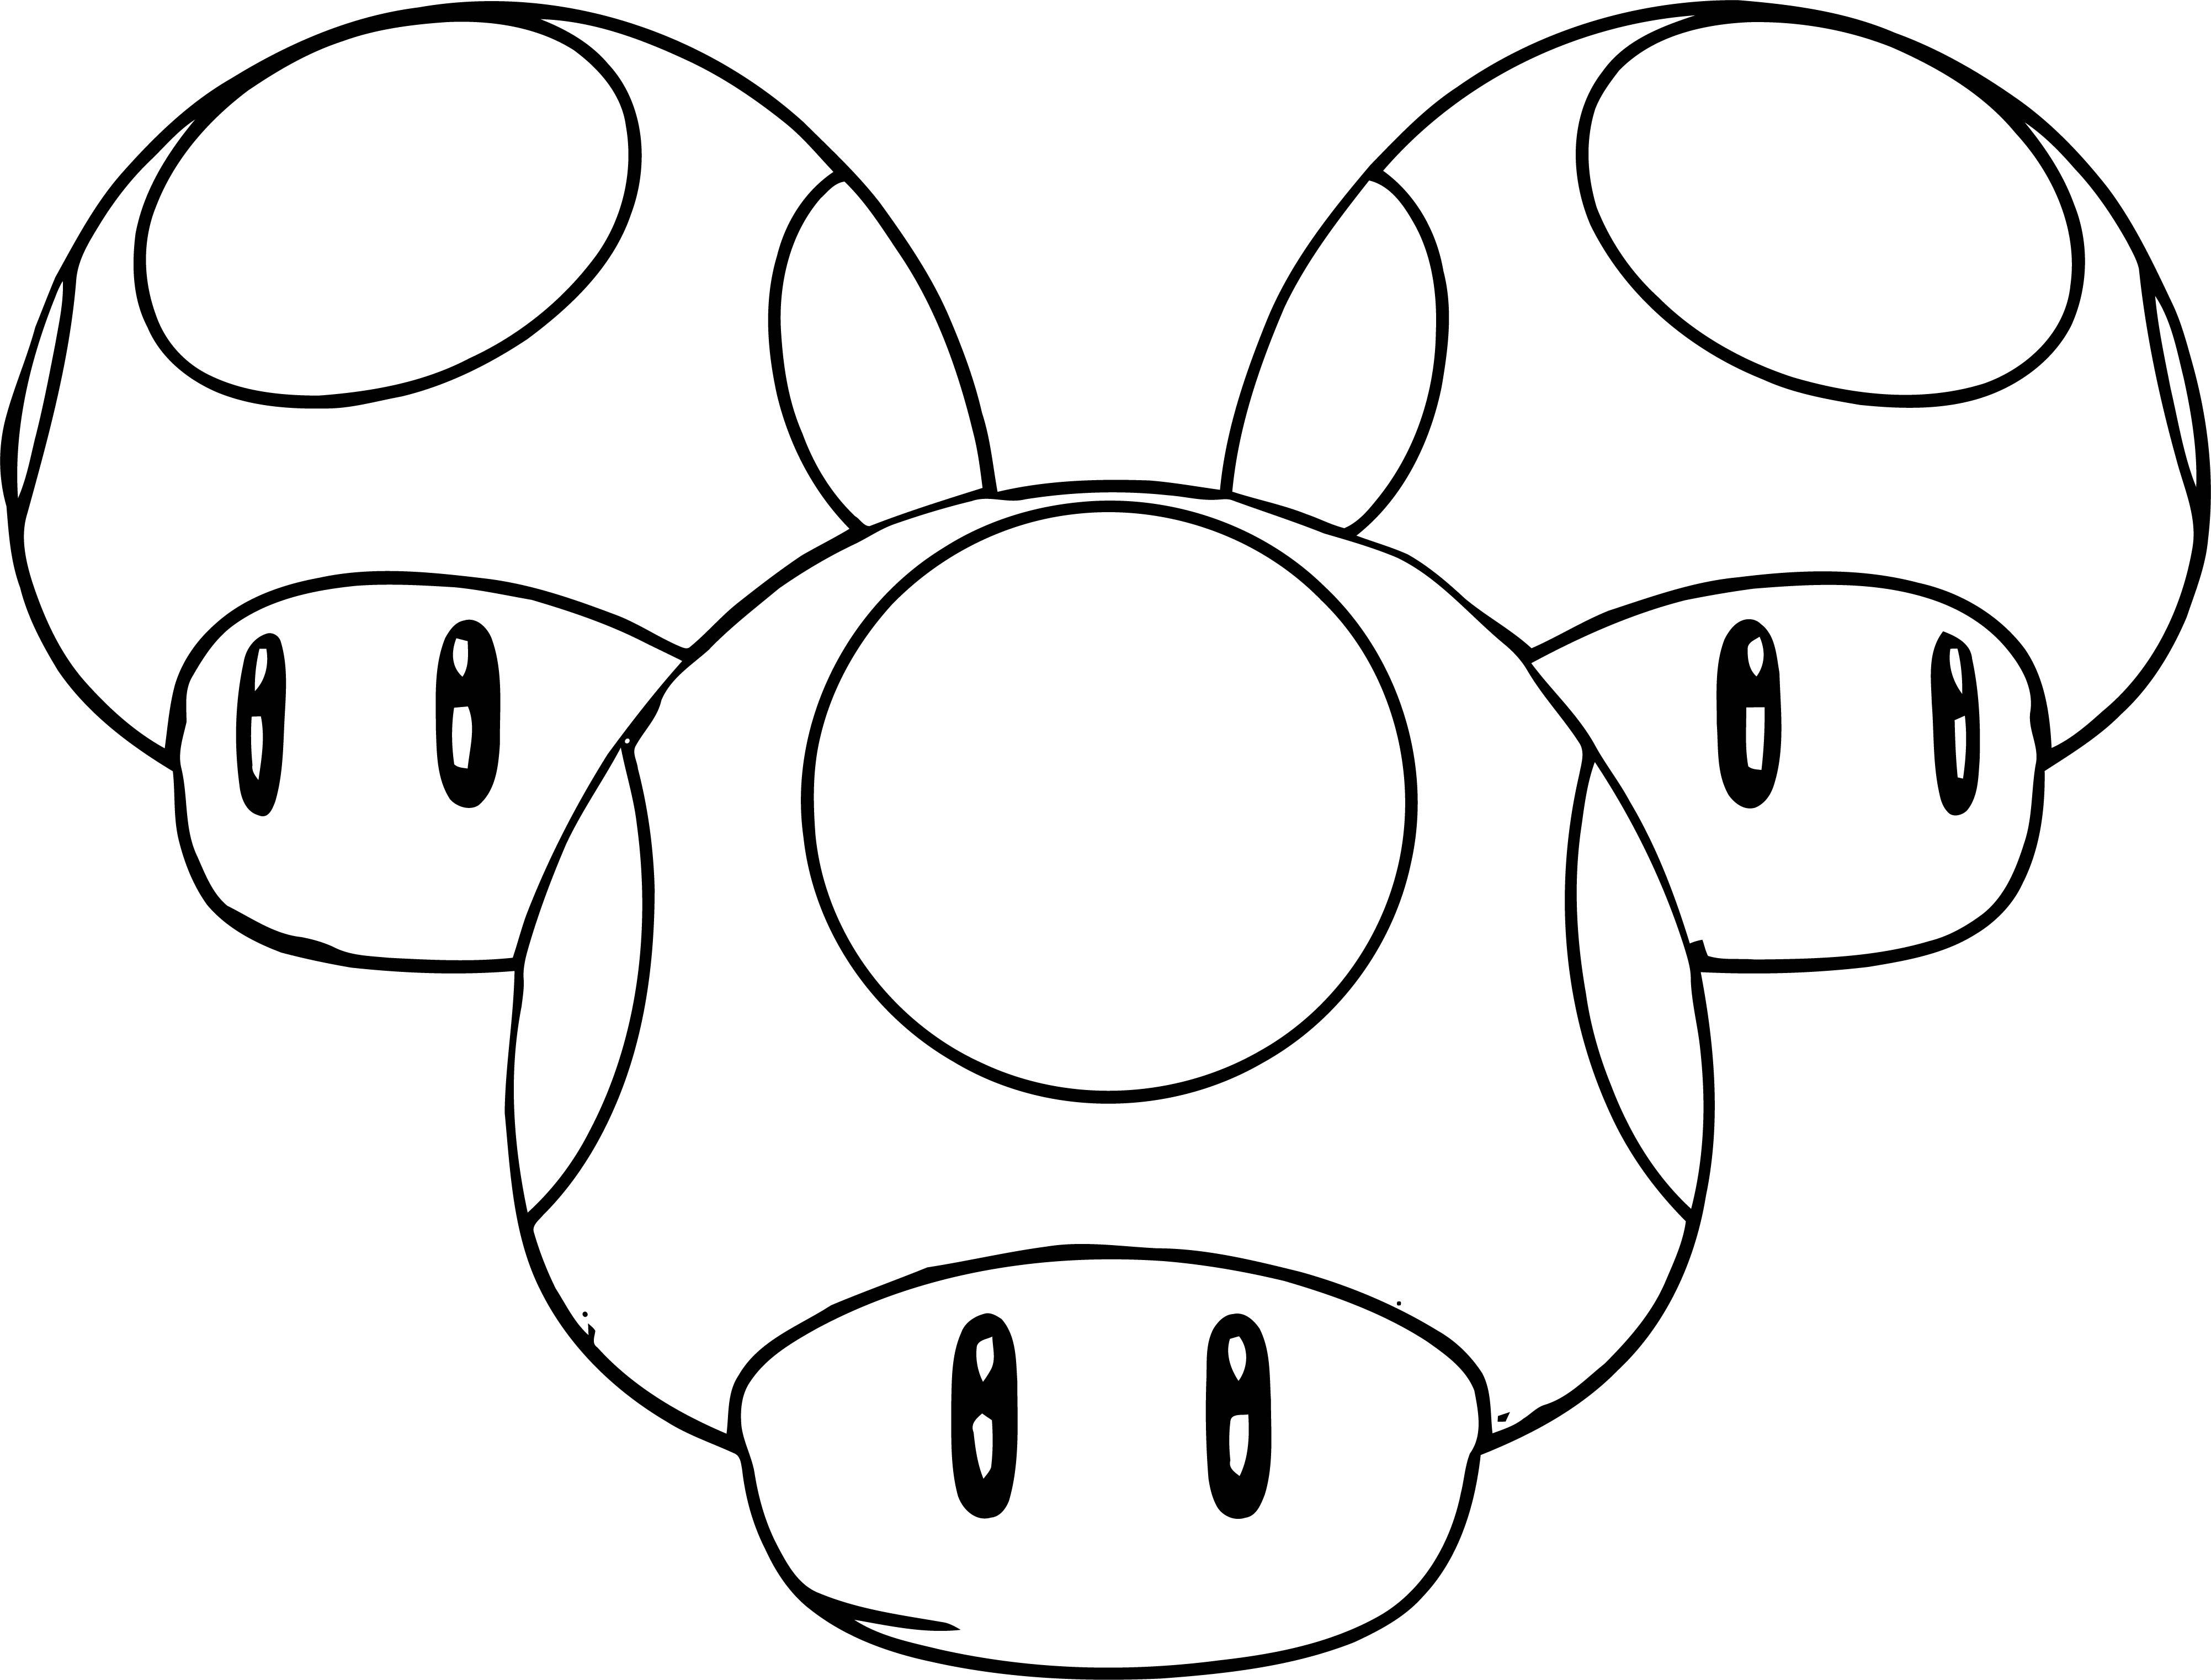 Mario Kart Wii Items Mario Kart Coloring Page